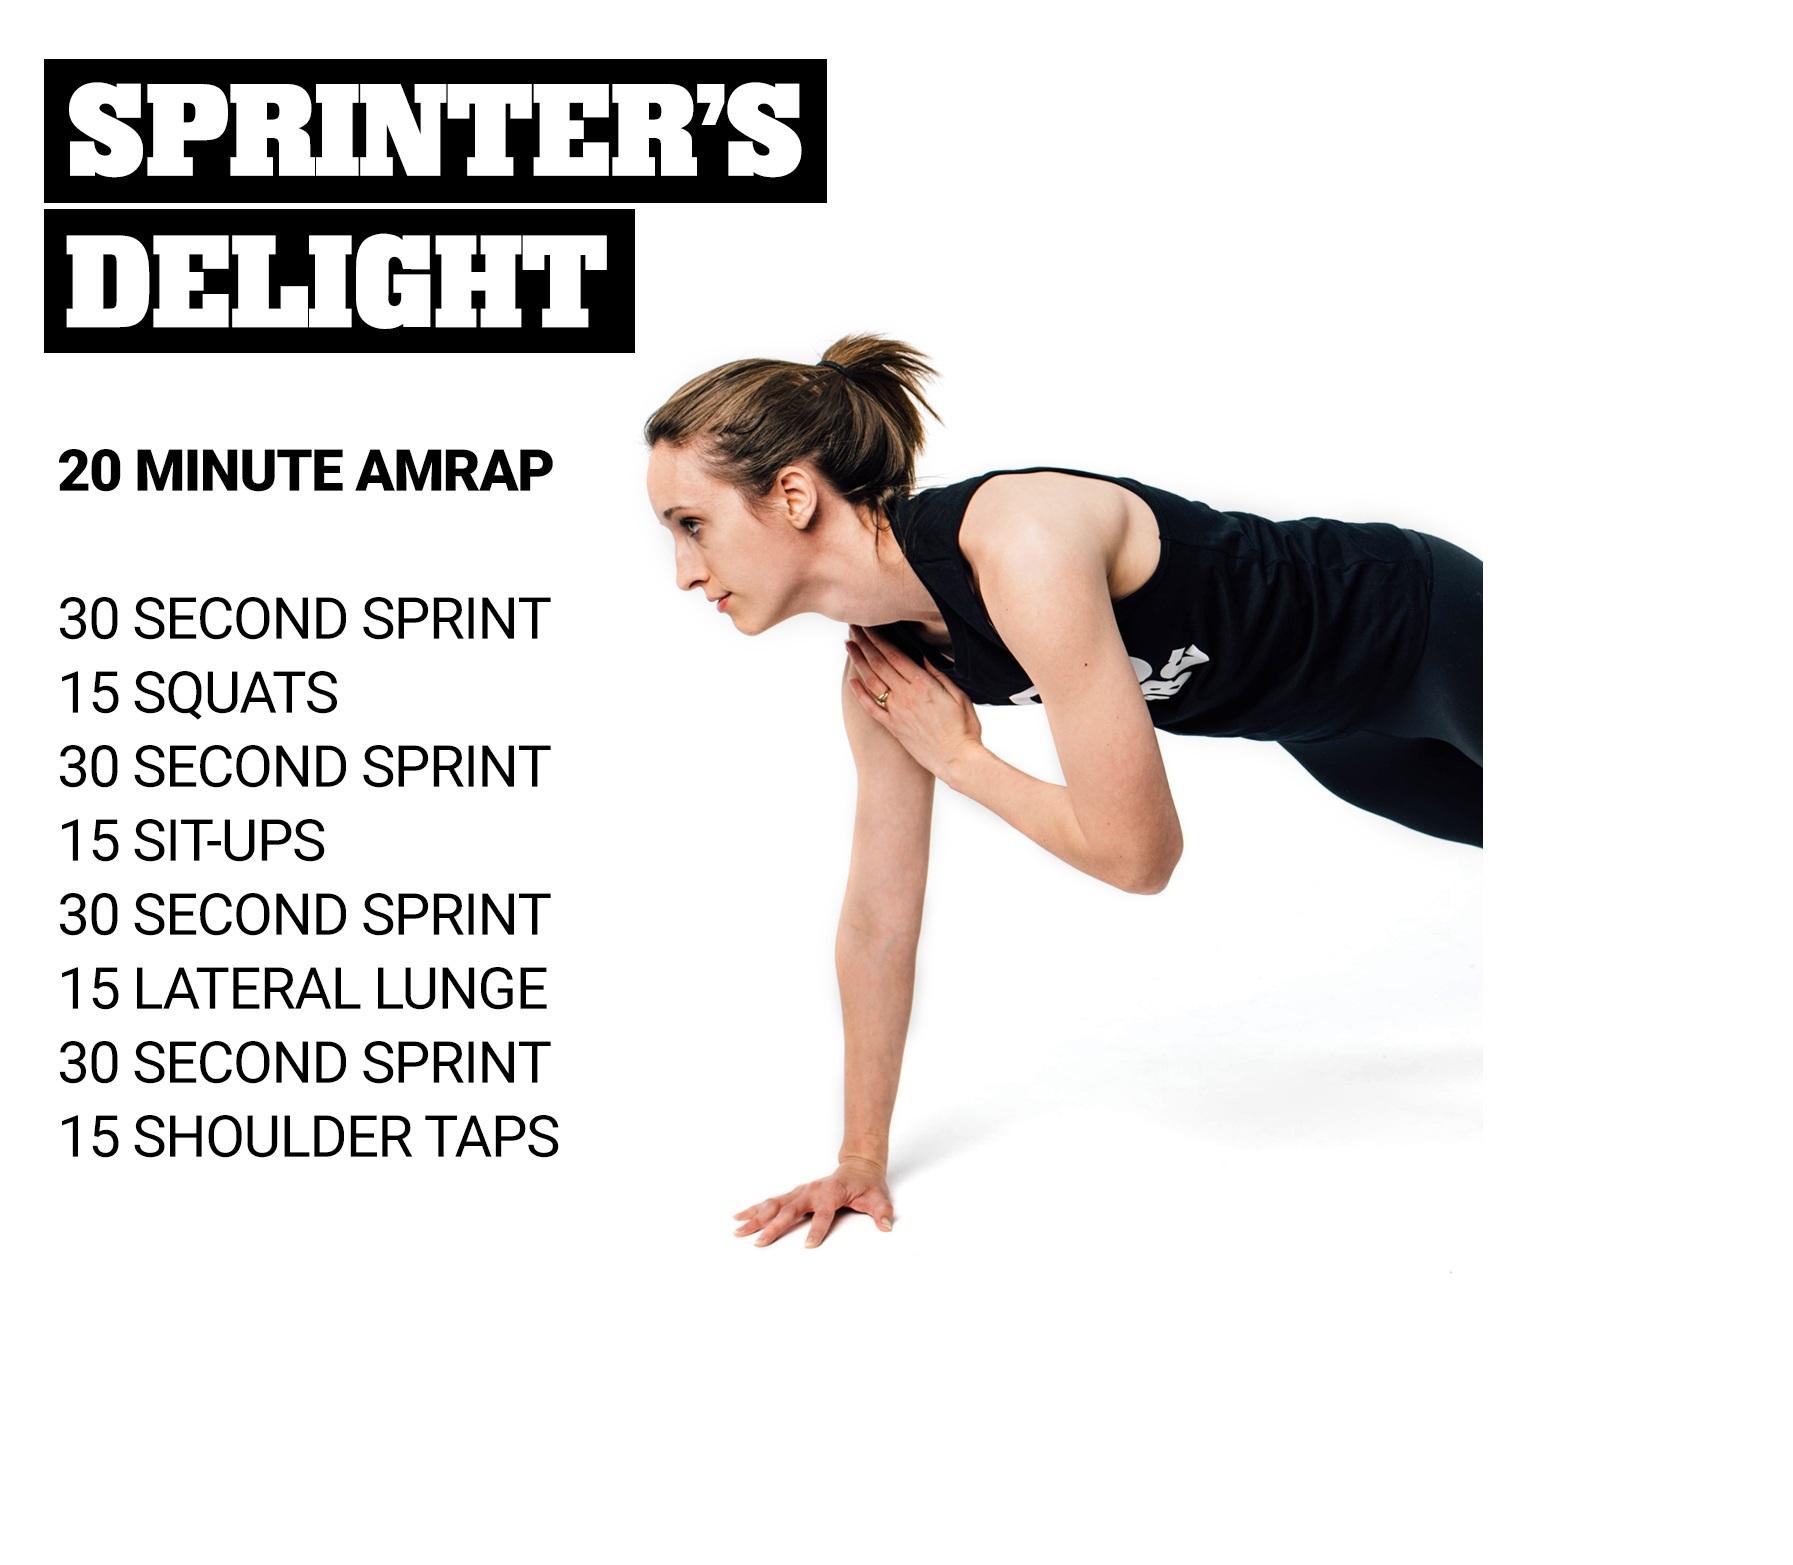 Sprinters Delight